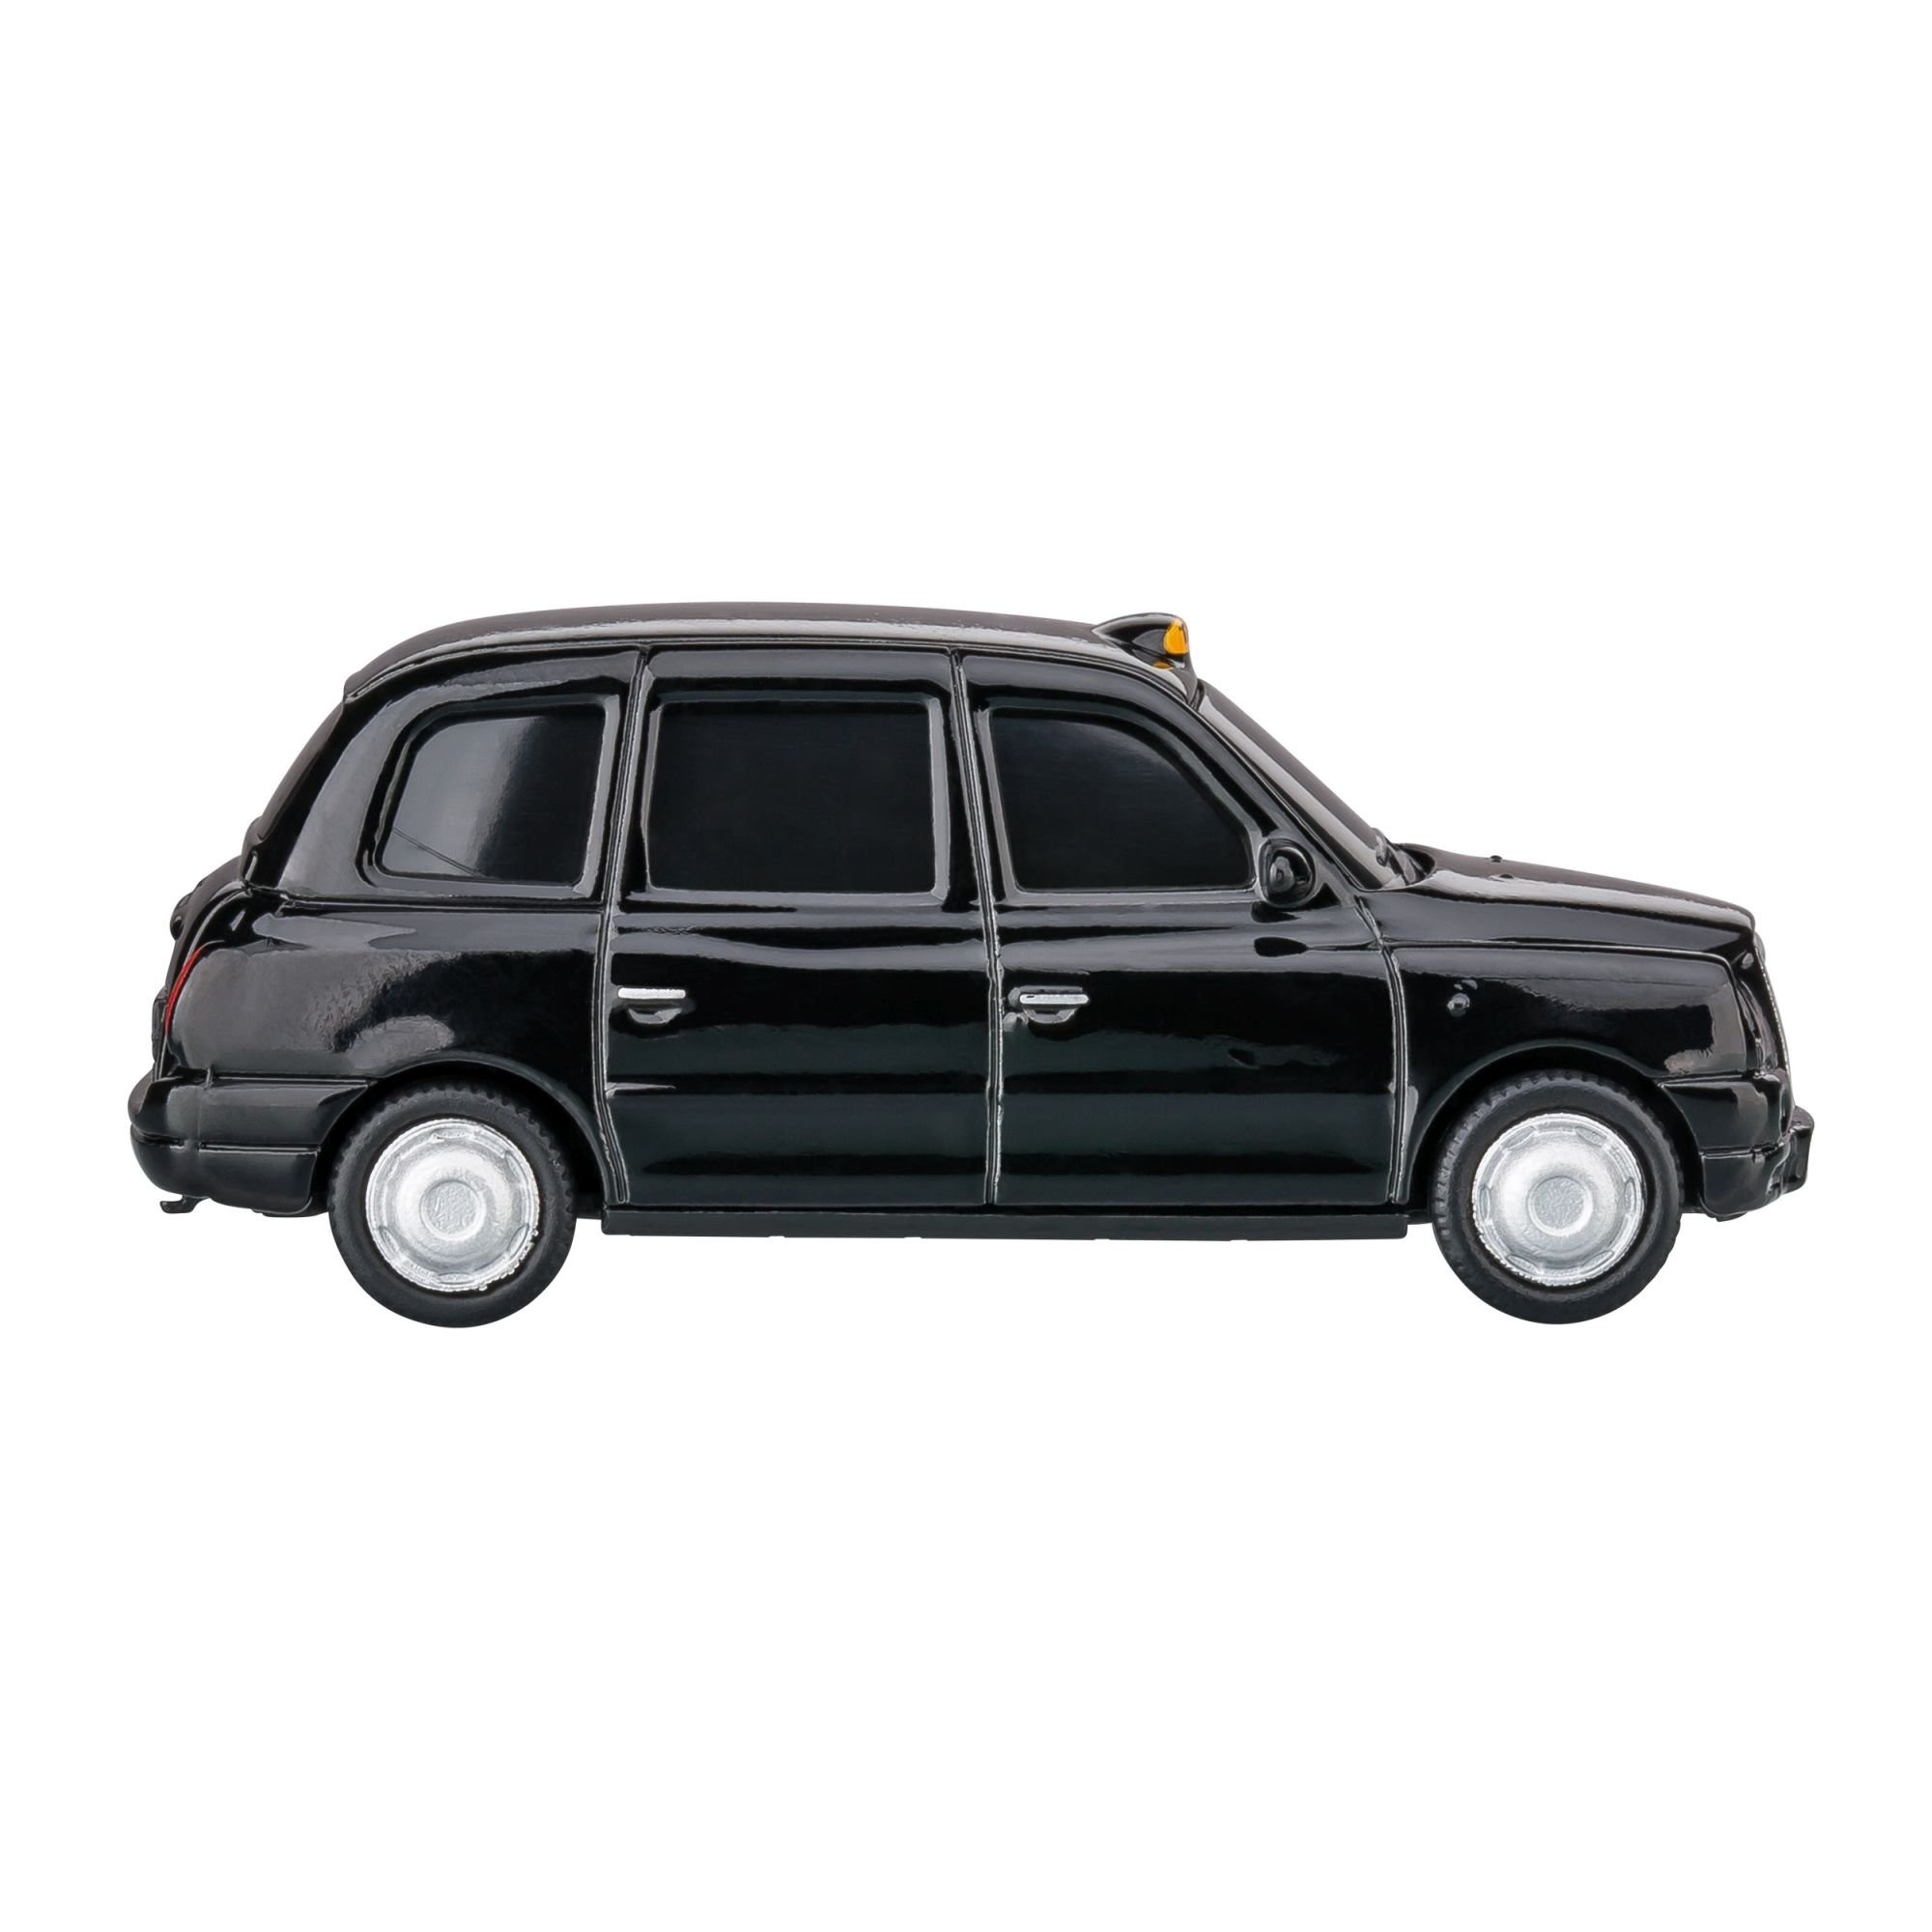 USB flash drive London Taxi TX4 1:72 BLACK 16GB, View 3